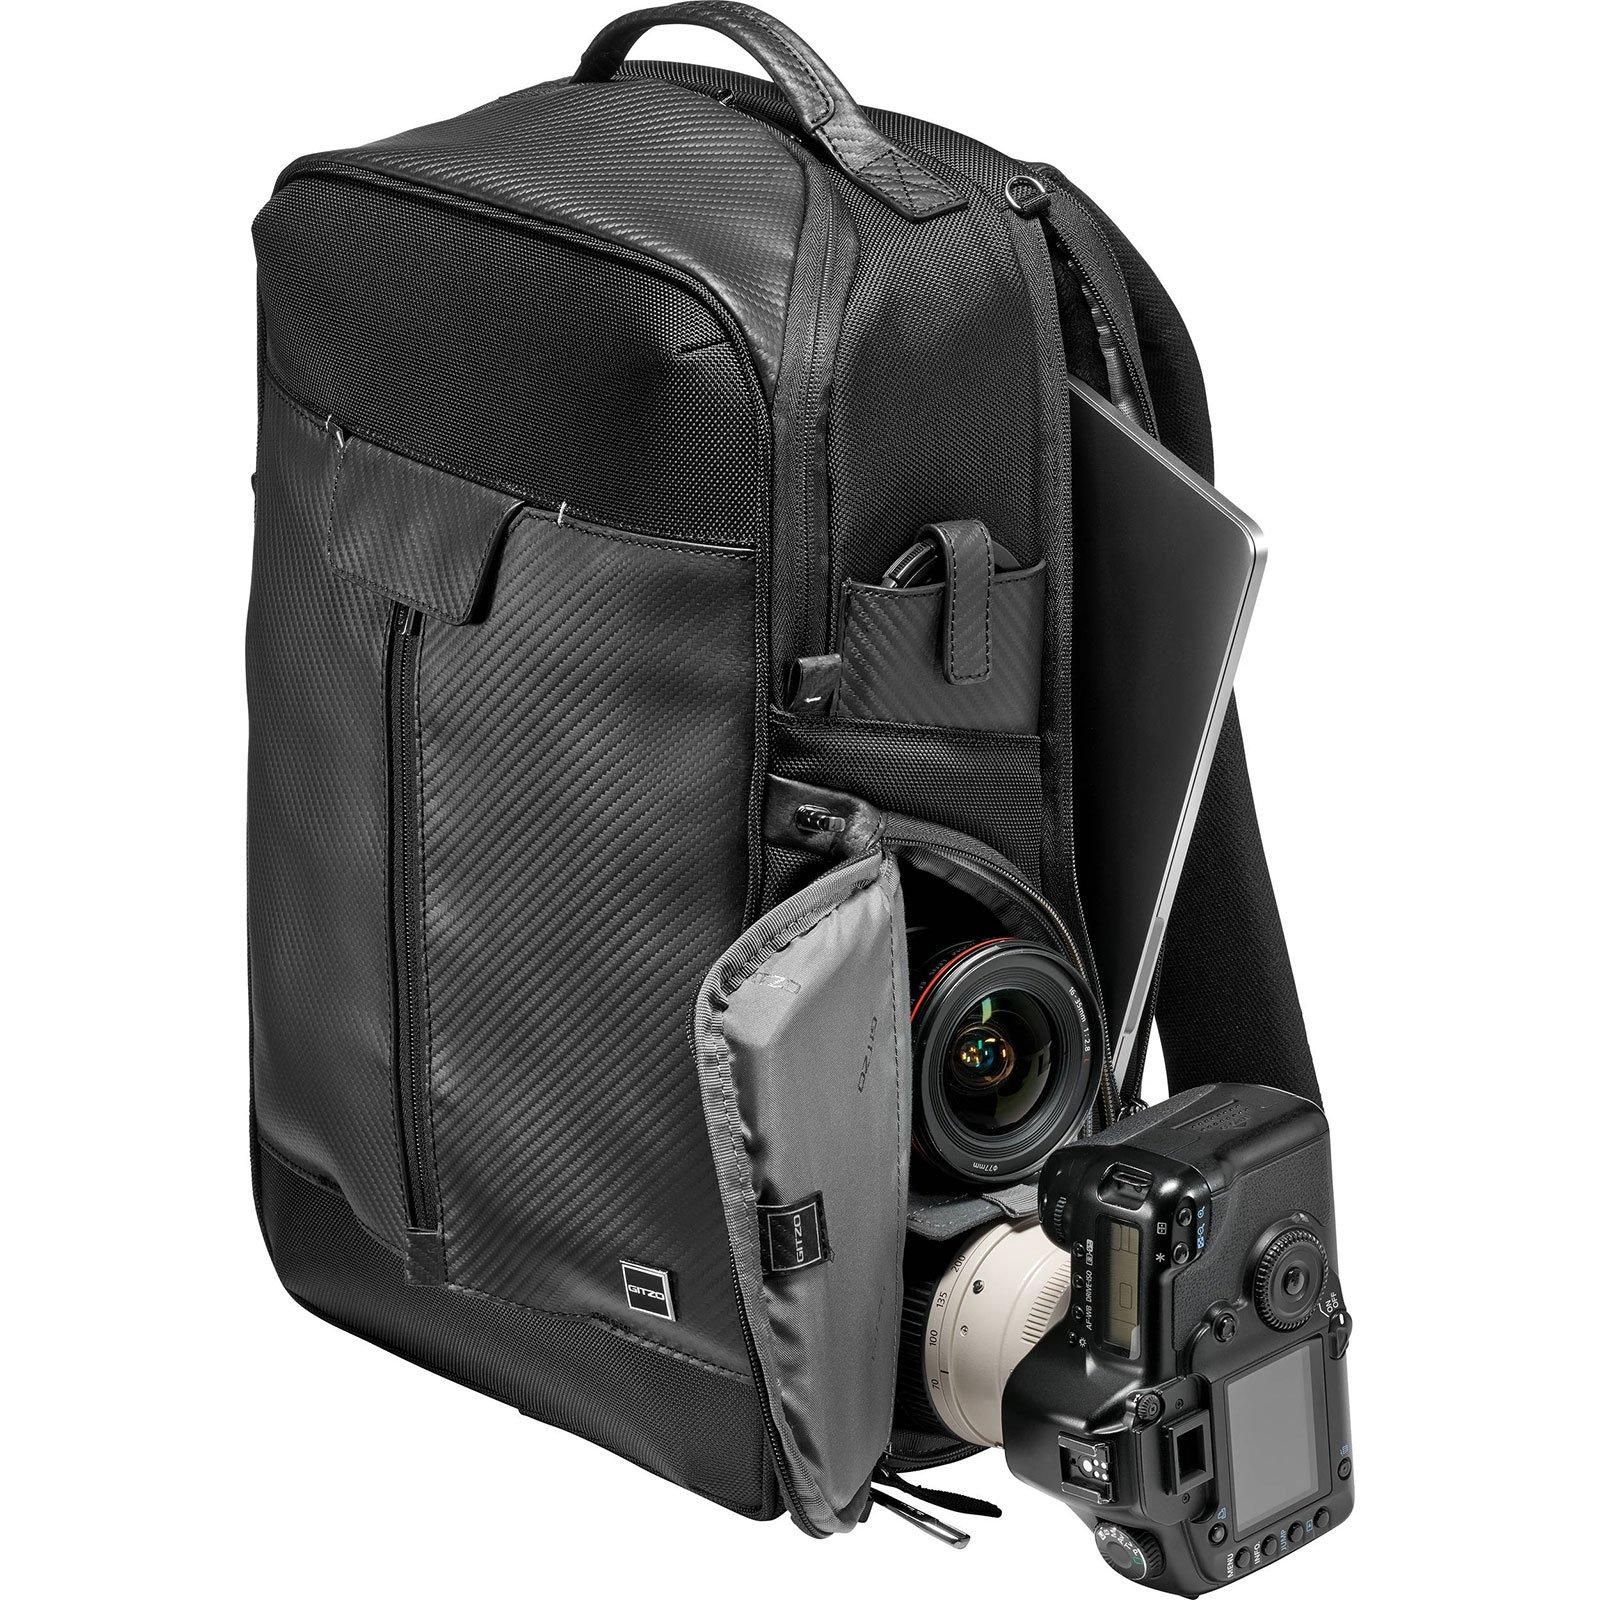 Gitzo Century Traveler Digital SLR Camera Backpack with Flash Diffuser Set + Lens & Sensor Cleaning Pens + Kit by Gitzo (Image #3)